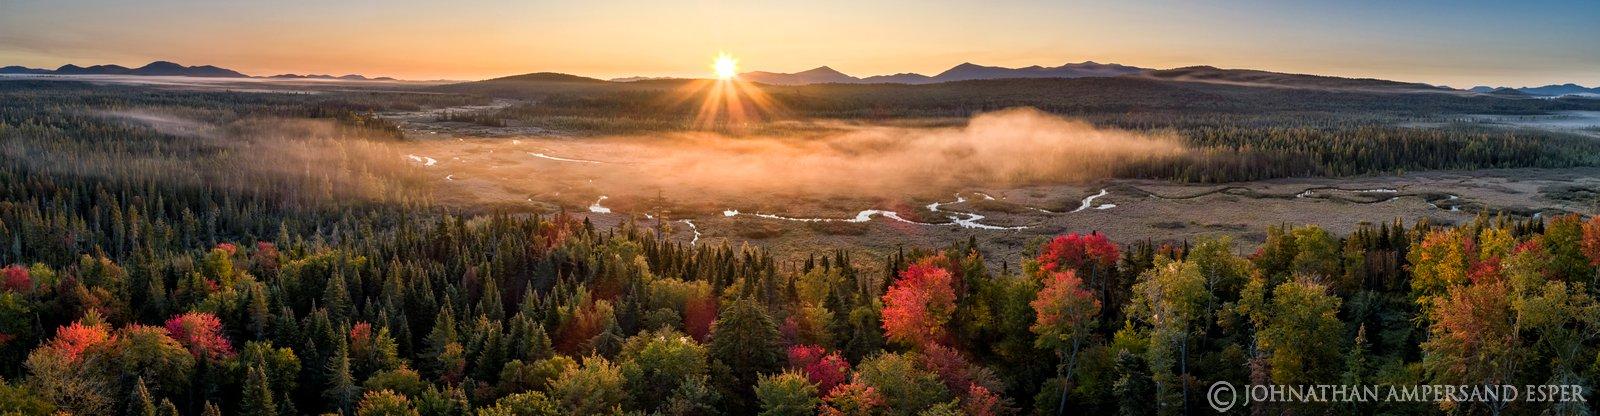 Bloomingdale Bog,wetlands,Adirondack wetlands,bog,sunrise,fog,autumn,2019,Whiteface Mt,fall,drone,panorama,aerial